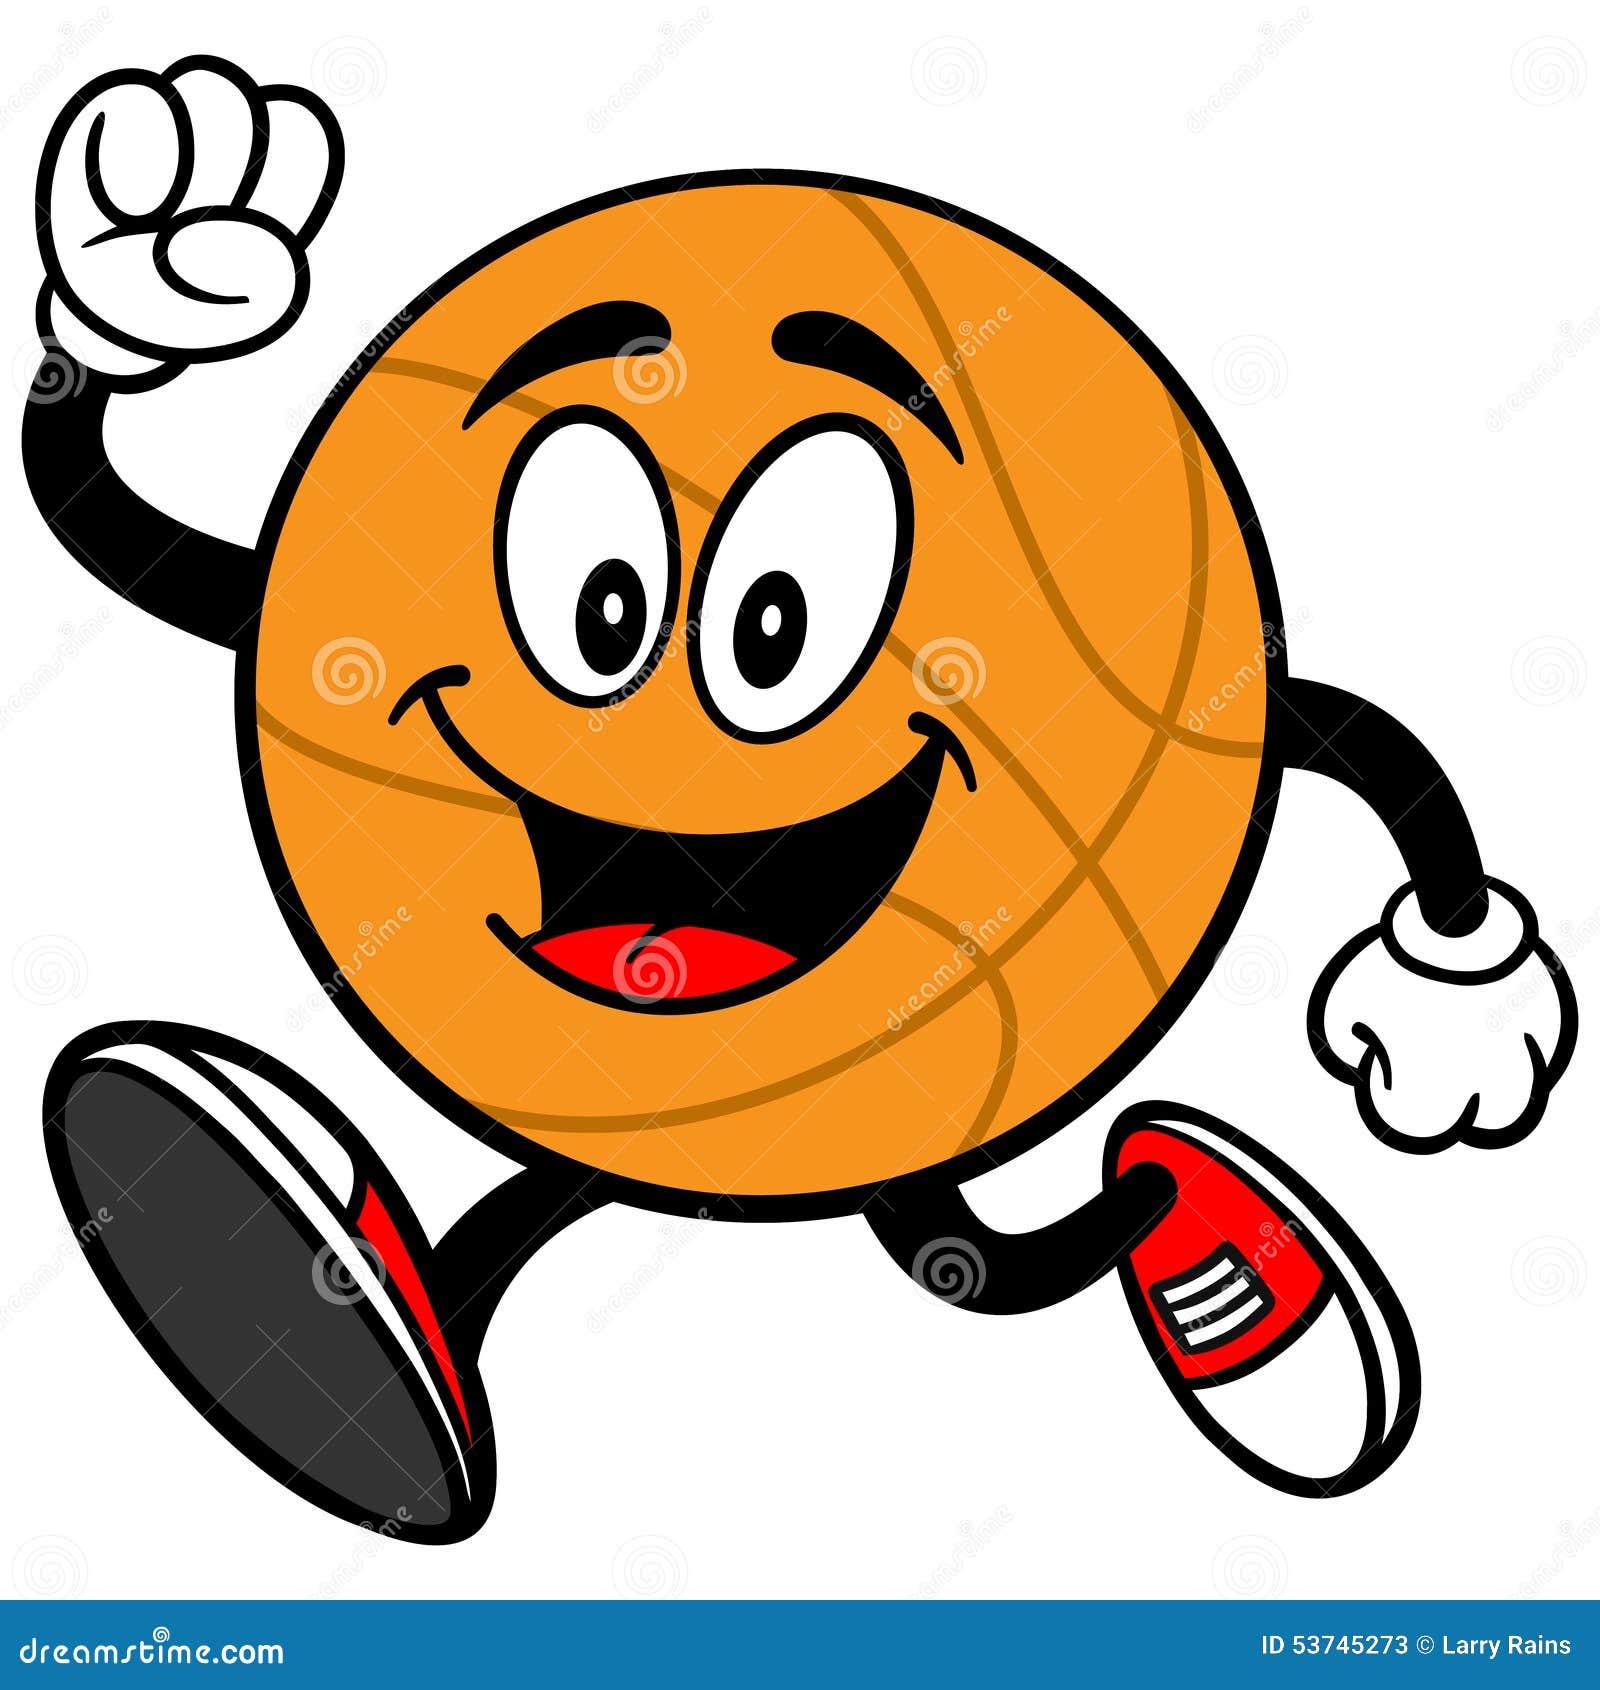 Cartoon Basketball Running Stock Vector - Image: 53745273